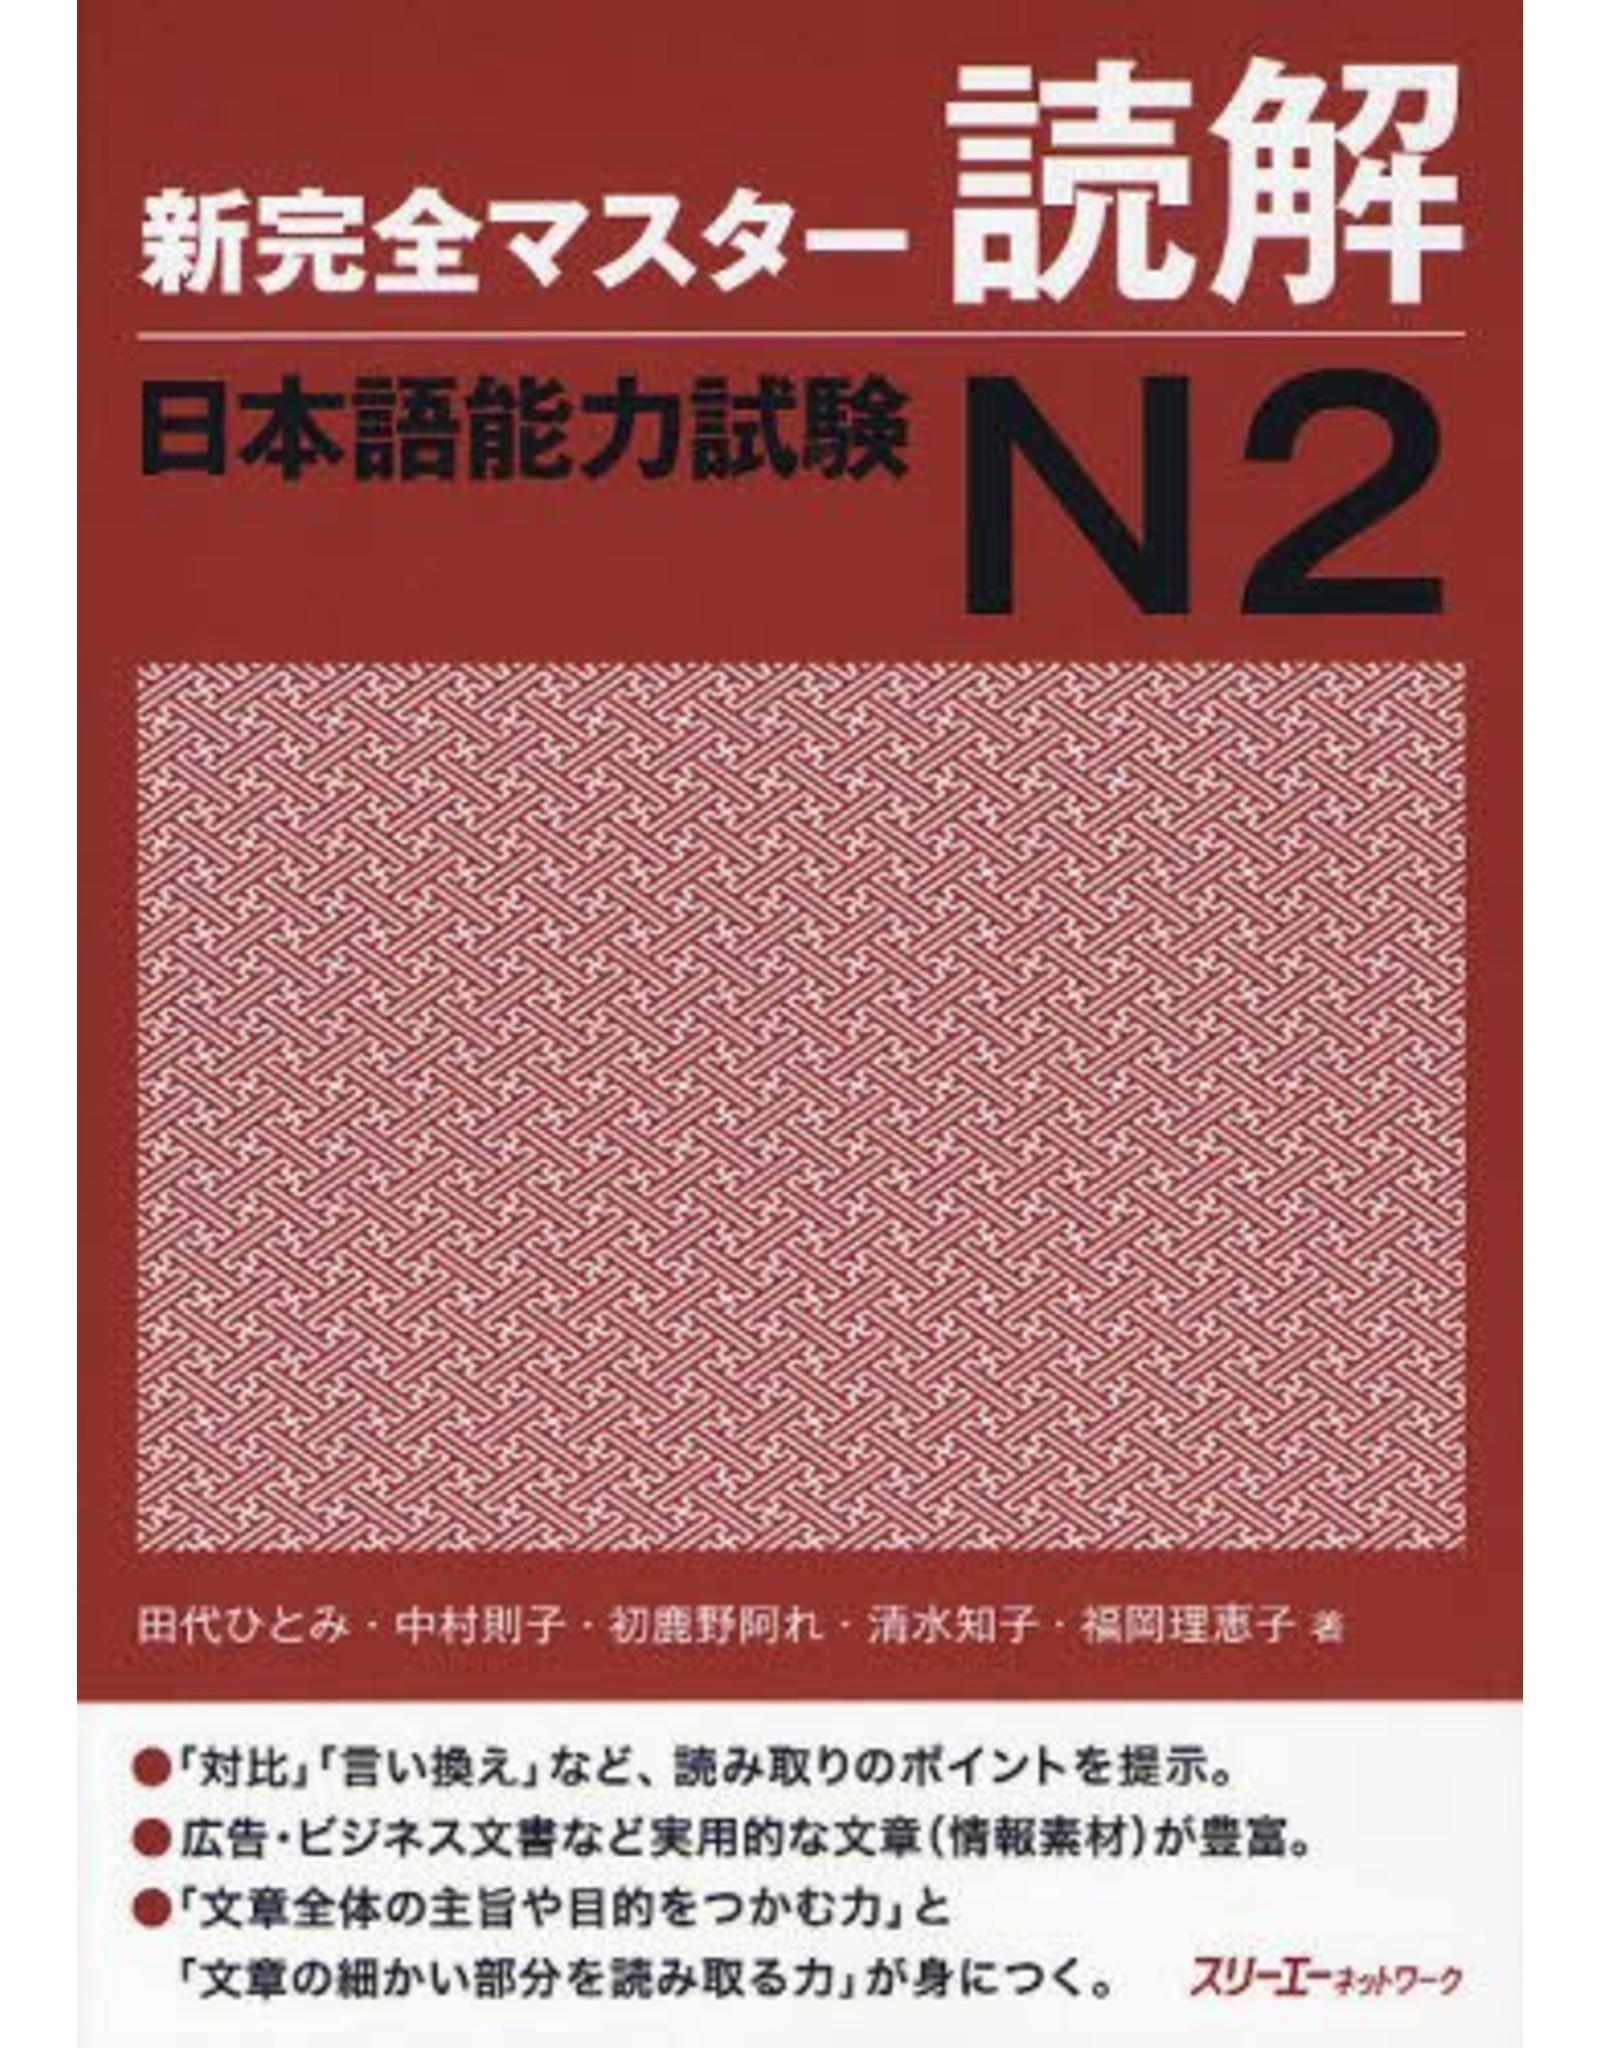 3A Corporation NEW KANZEN MASTER JLPT N2 DOKKAI